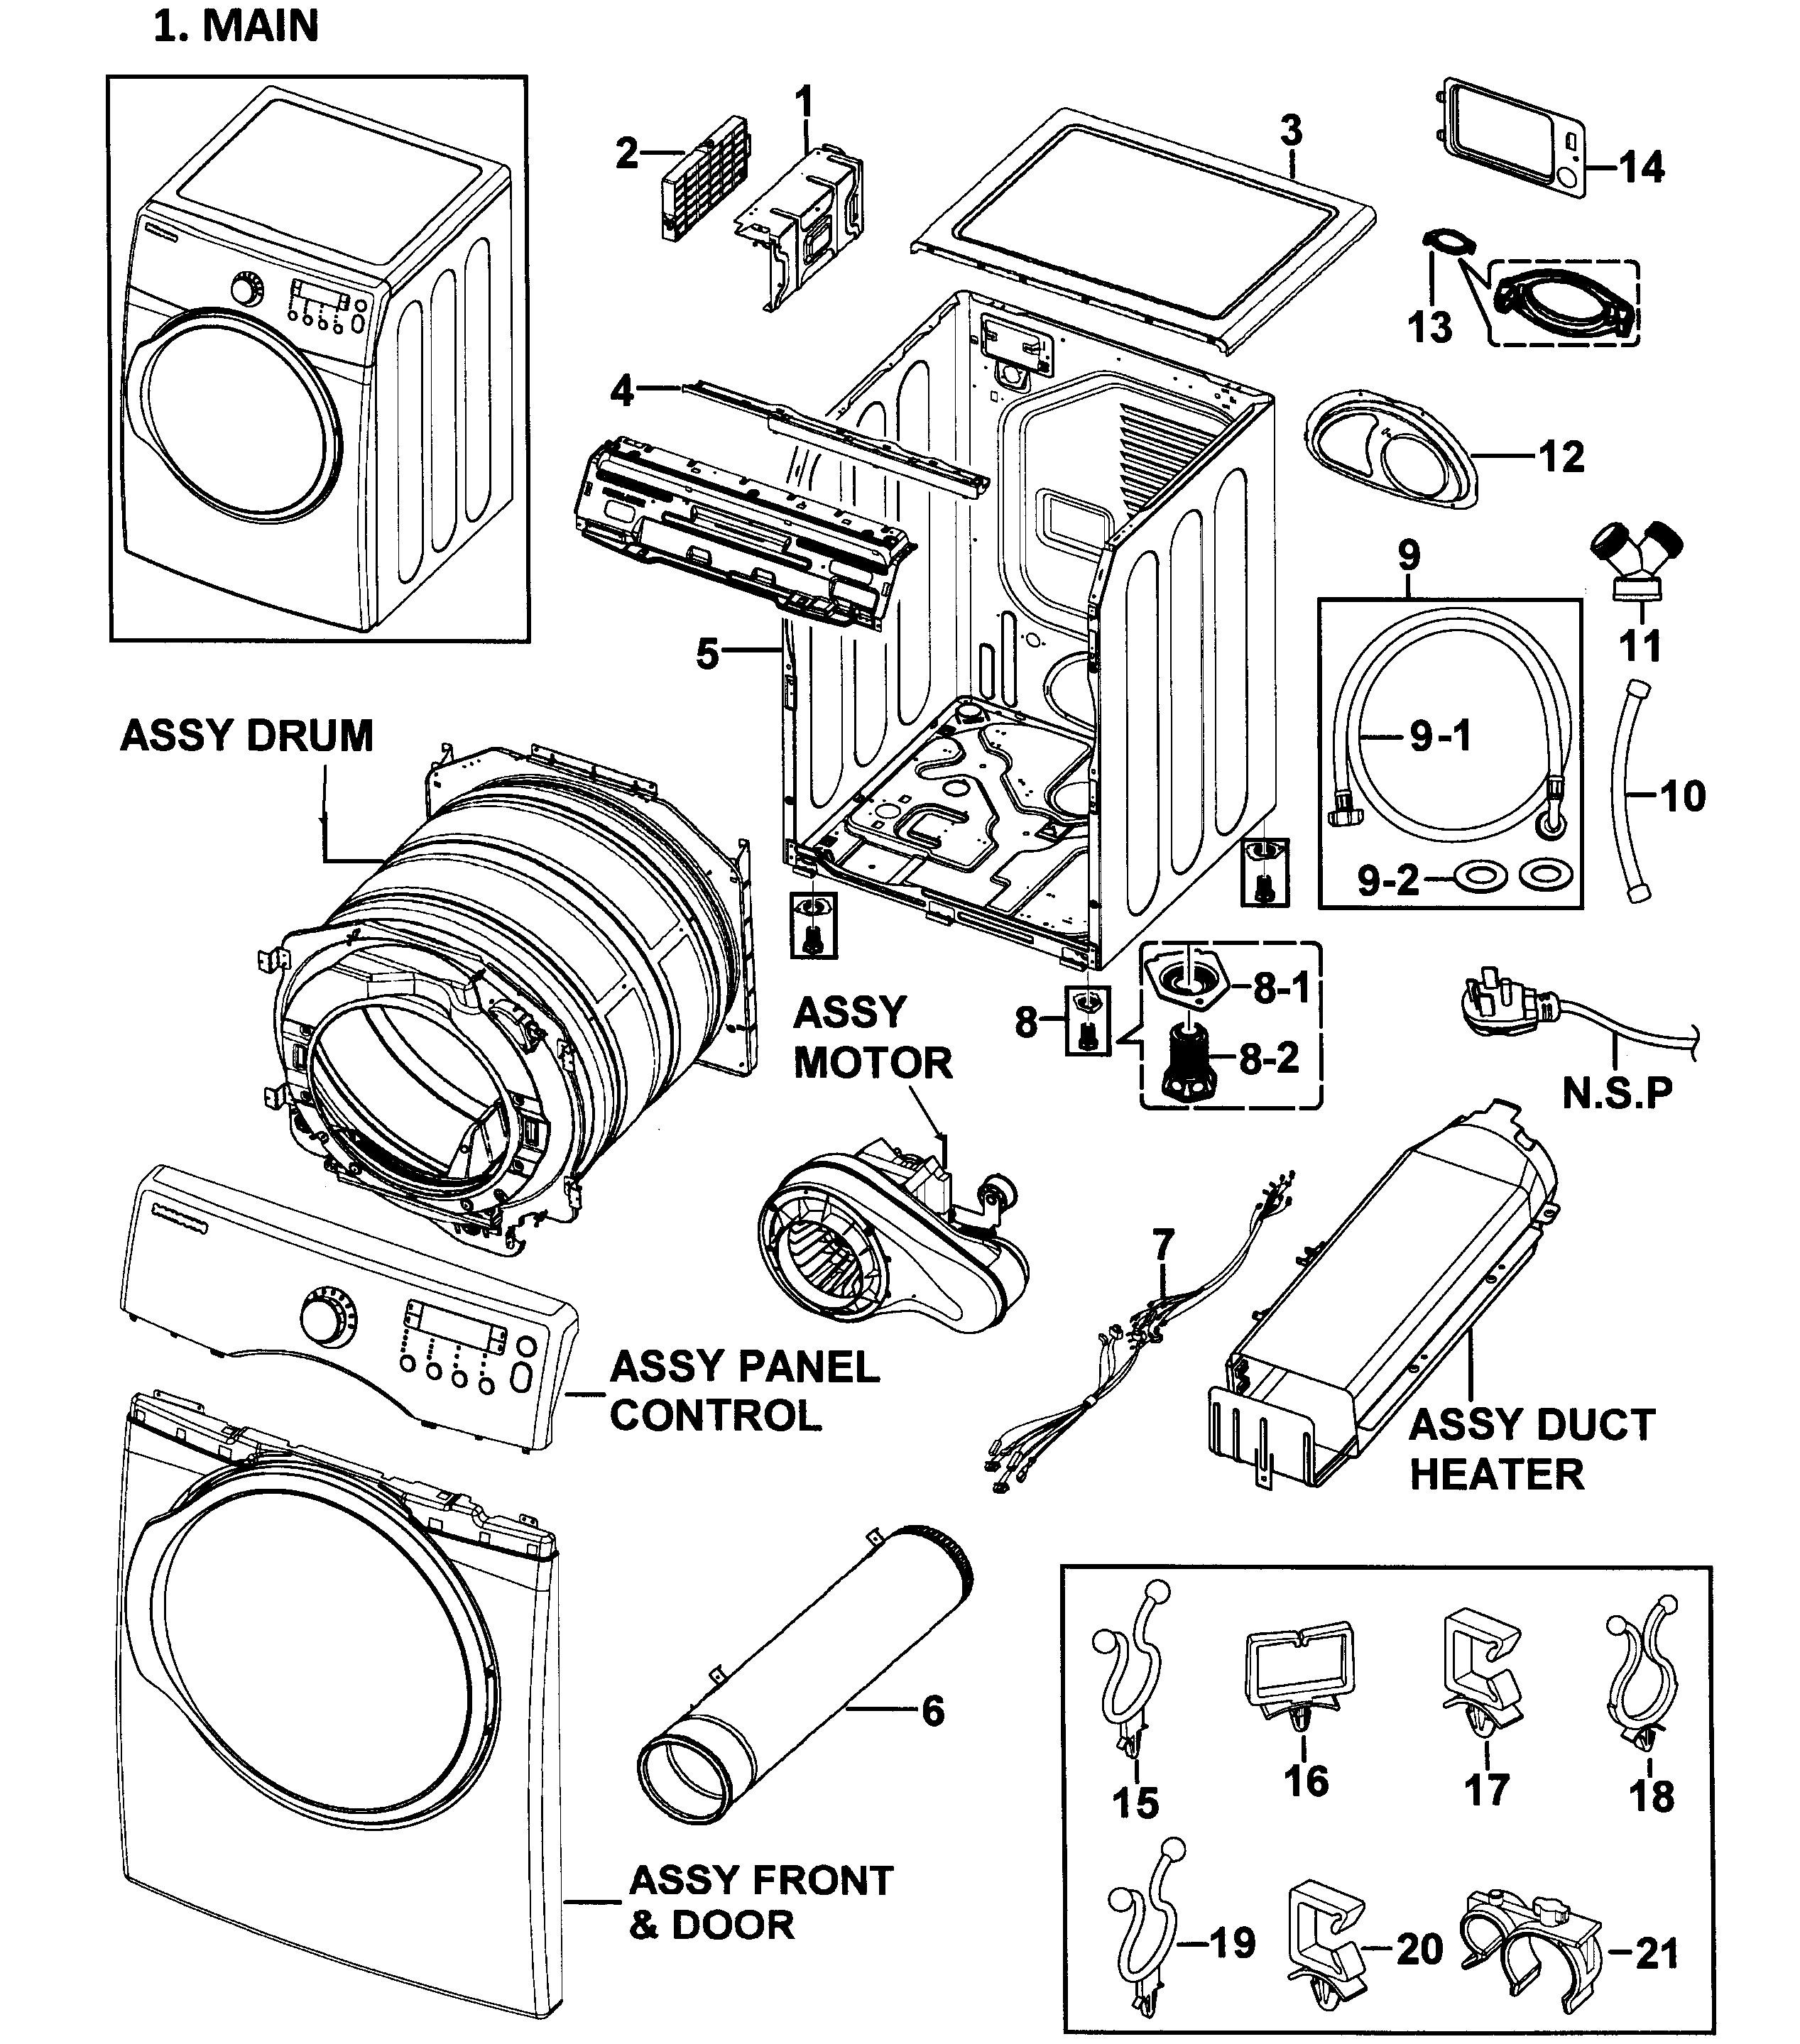 Ge Dryer Parts Diagram Samsung Model Dv350aer Xaa 0000 Residential ...